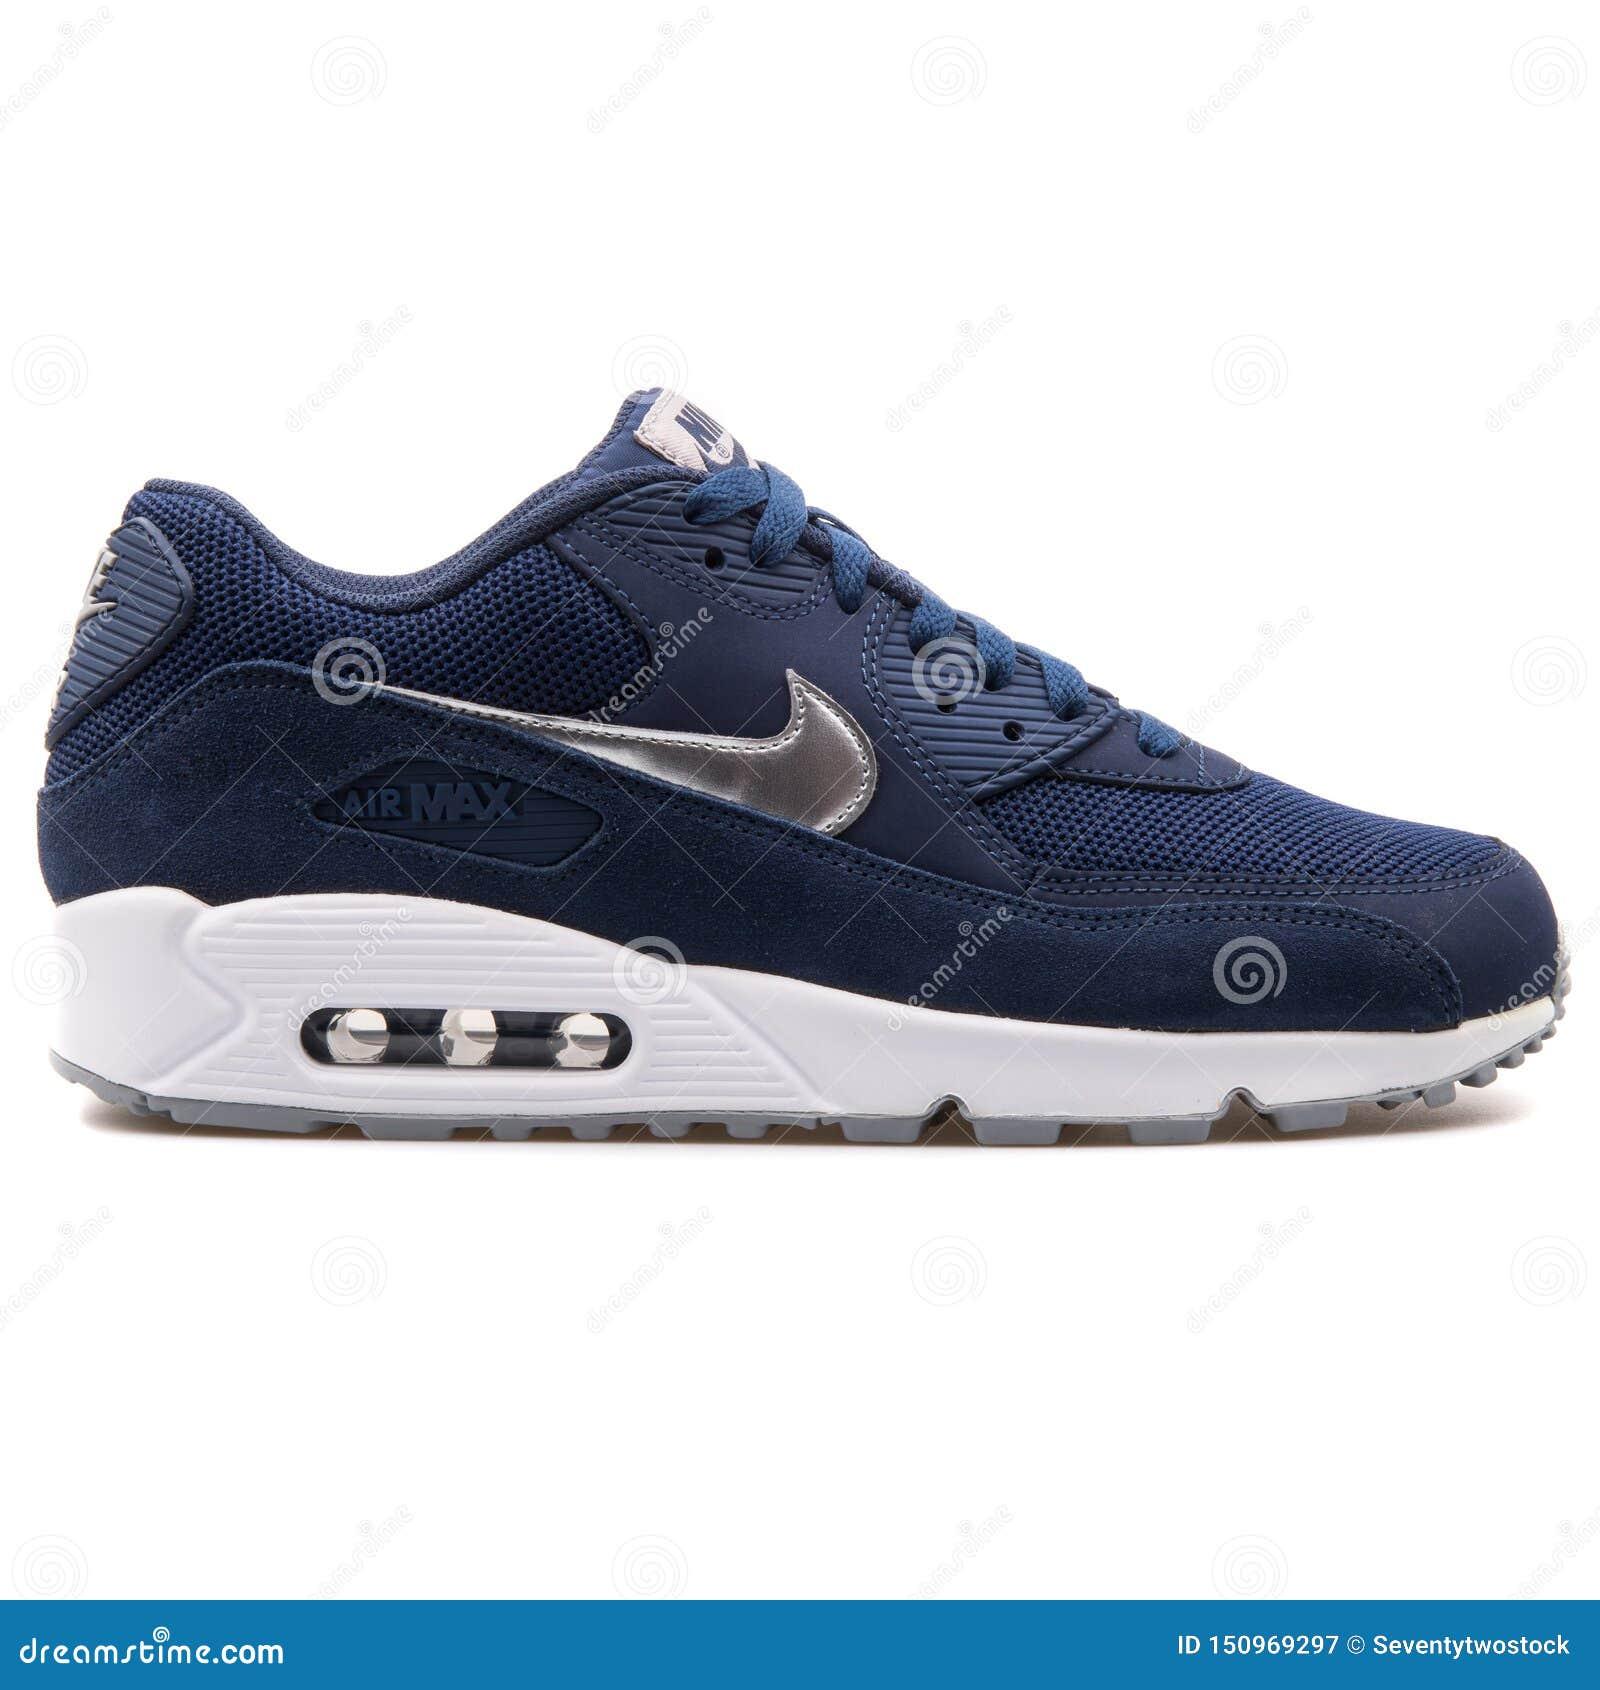 Montañas climáticas Posdata Mayordomo  Nike Air Max 90 Essential Navy Blue Sneaker Editorial Photography - Image  of leather, navy: 150969297